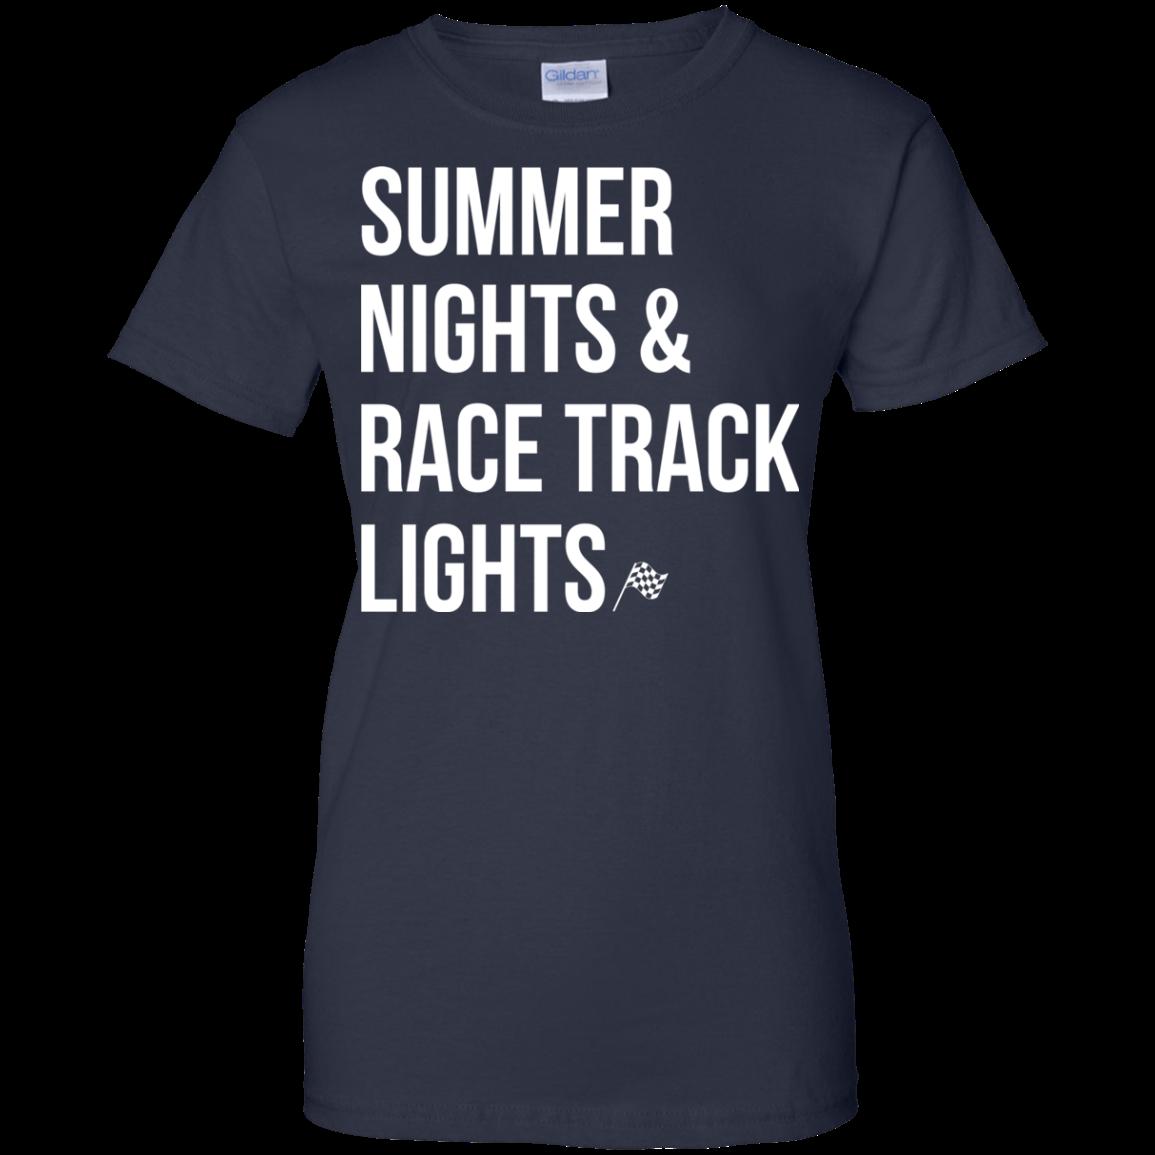 Summer nights and race track lights shirt hoodie allbluetees summer nights and race track lights shirt hoodie aloadofball Gallery